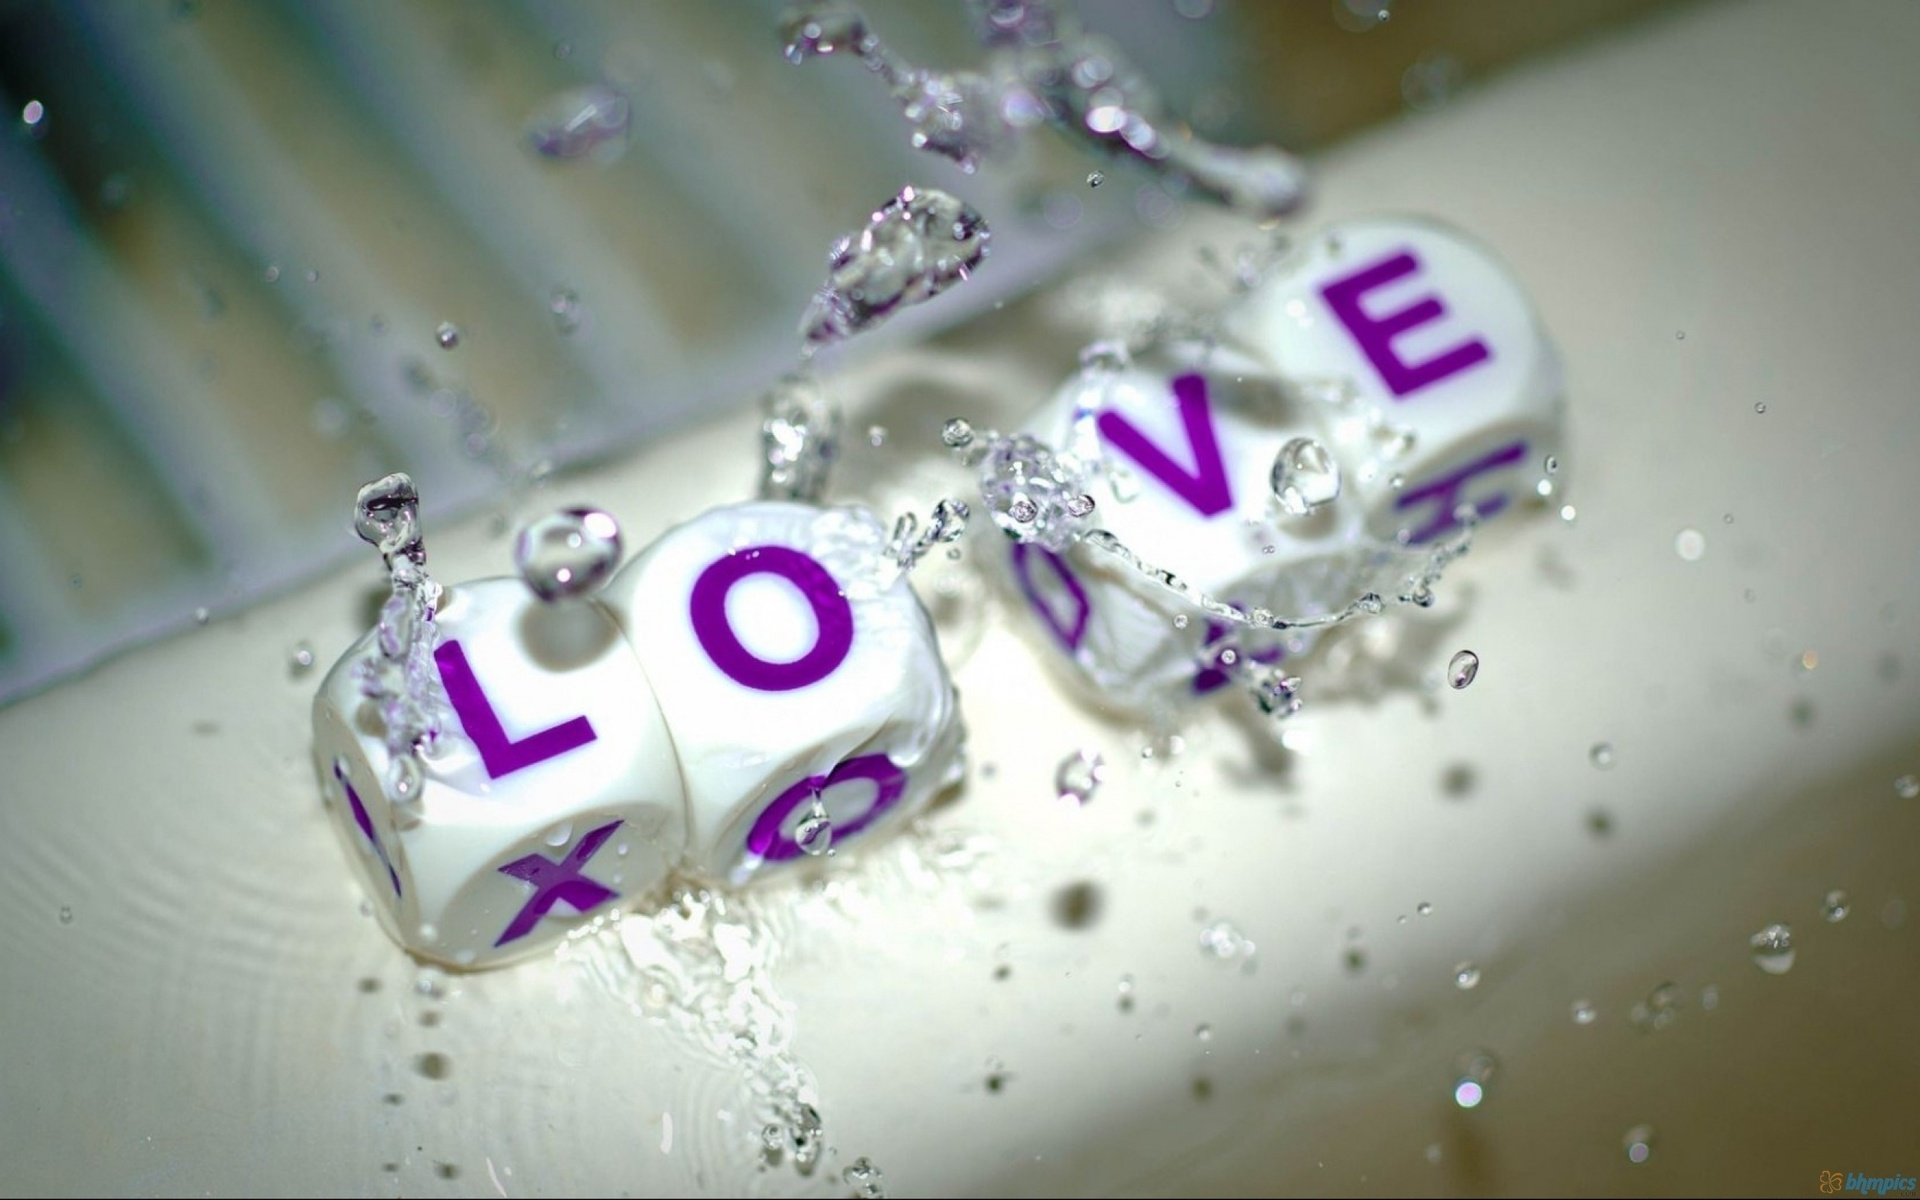 Simple Wallpaper Love Facebook - love-17  Collection_1183.jpg